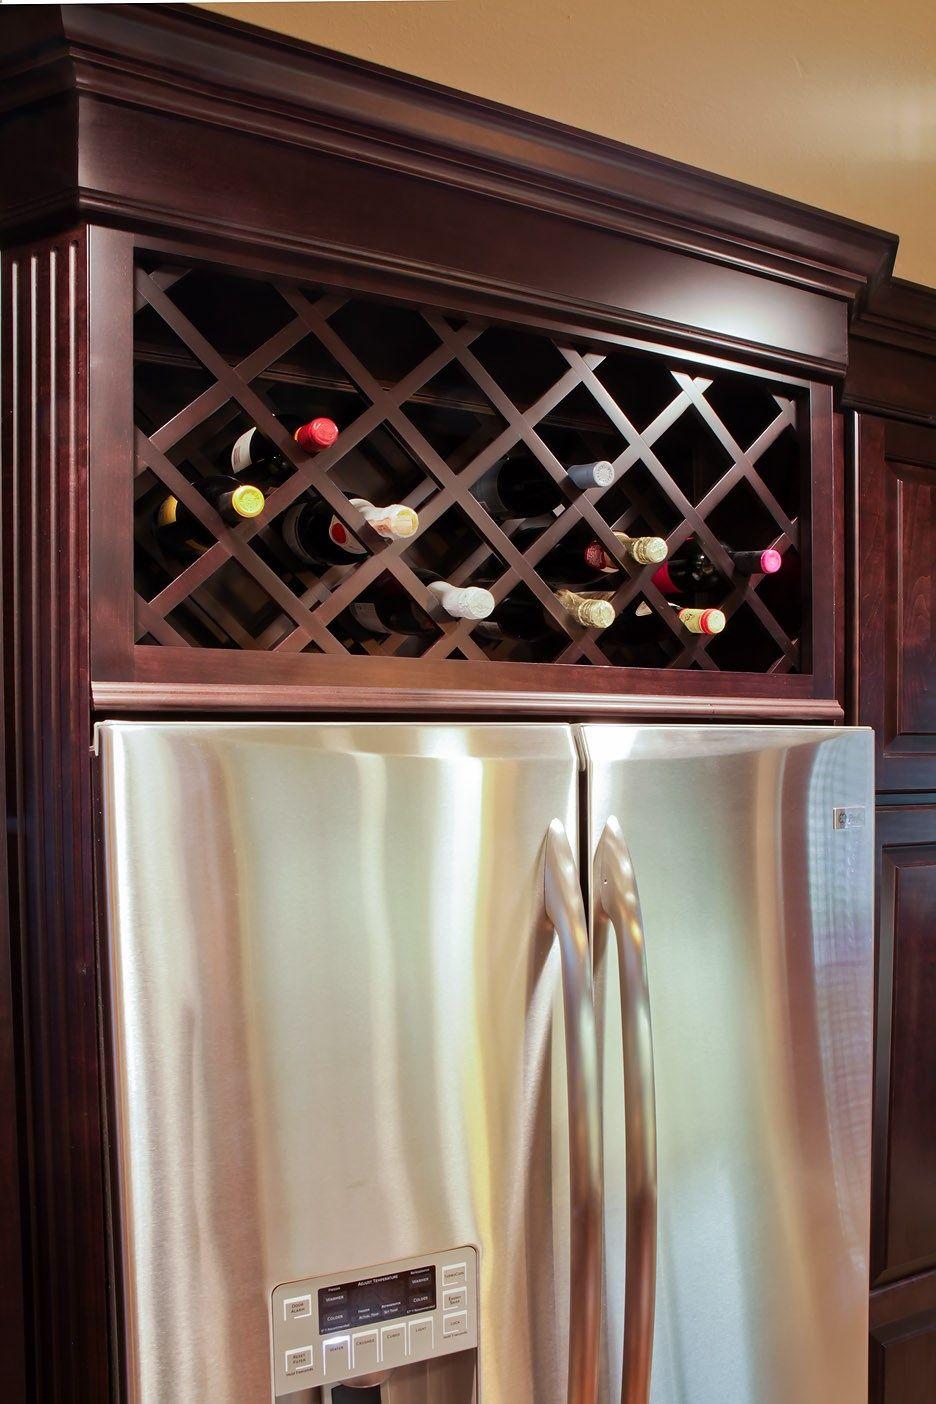 Wine Fridge Gallery Red River Remodelers Wine Rack Built In Above Refirgerator Dark Express Built In Wine Rack Wine Rack Design Kitchen Cabinet Wine Rack